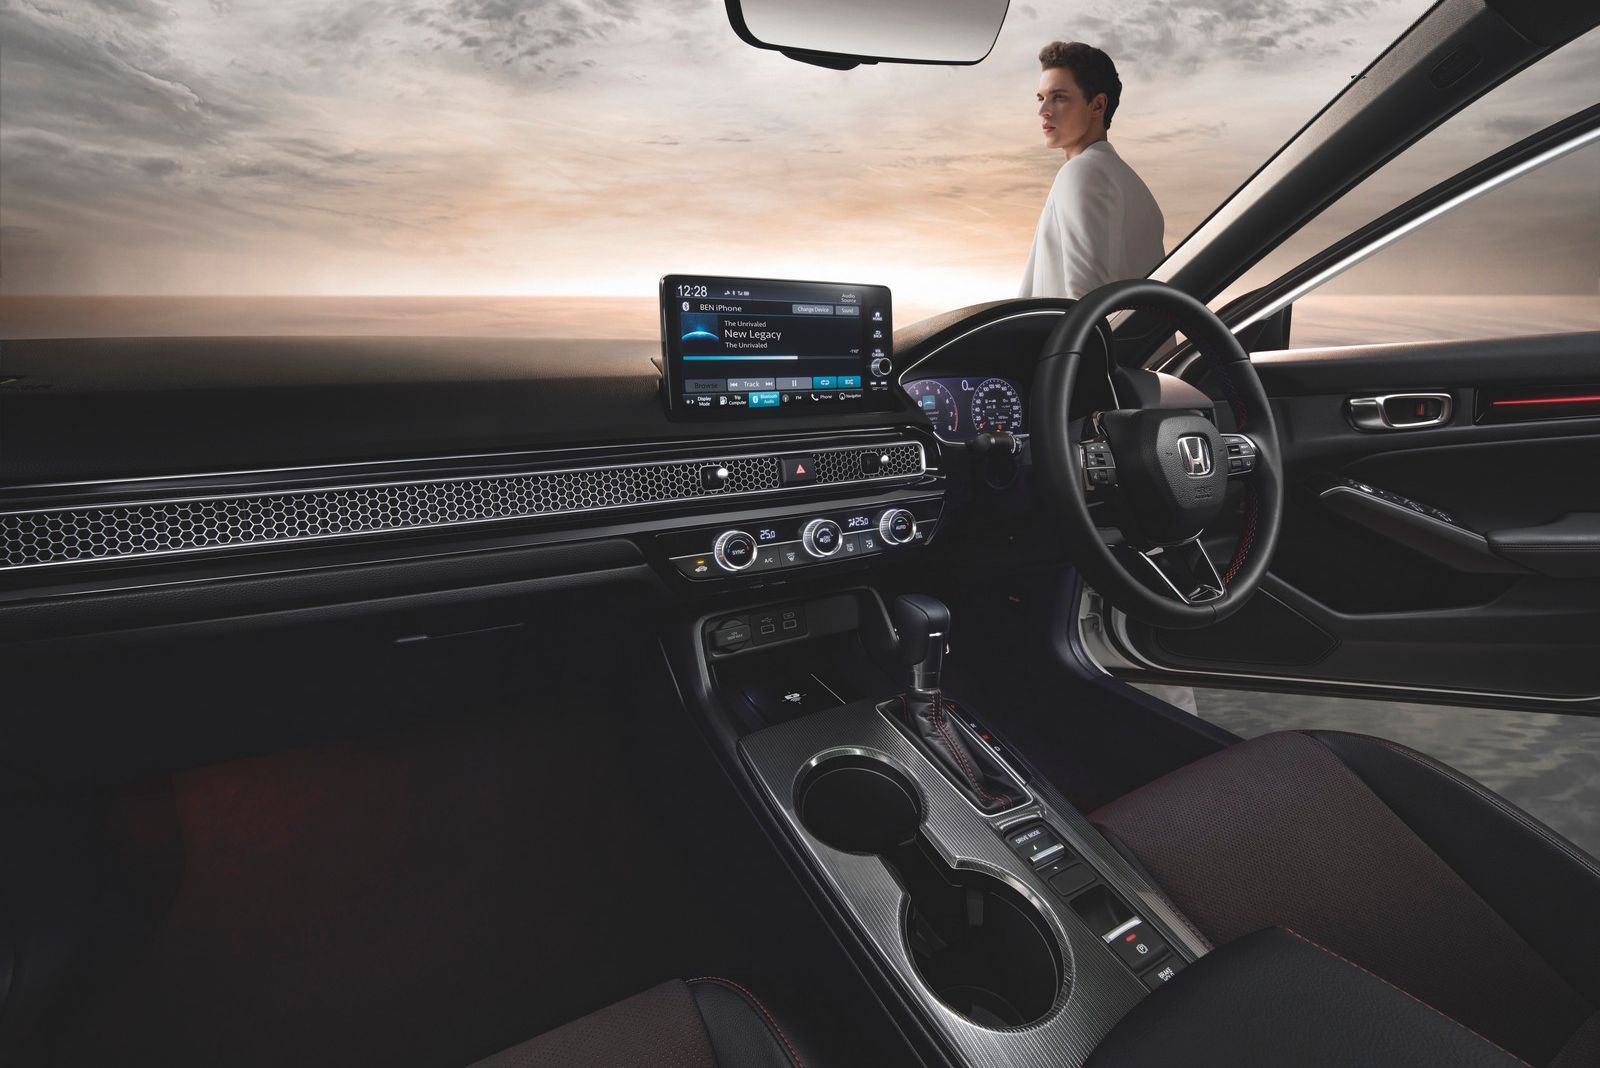 2022-Honda-Civic-Thailand-4-e1628256833471.jpeg